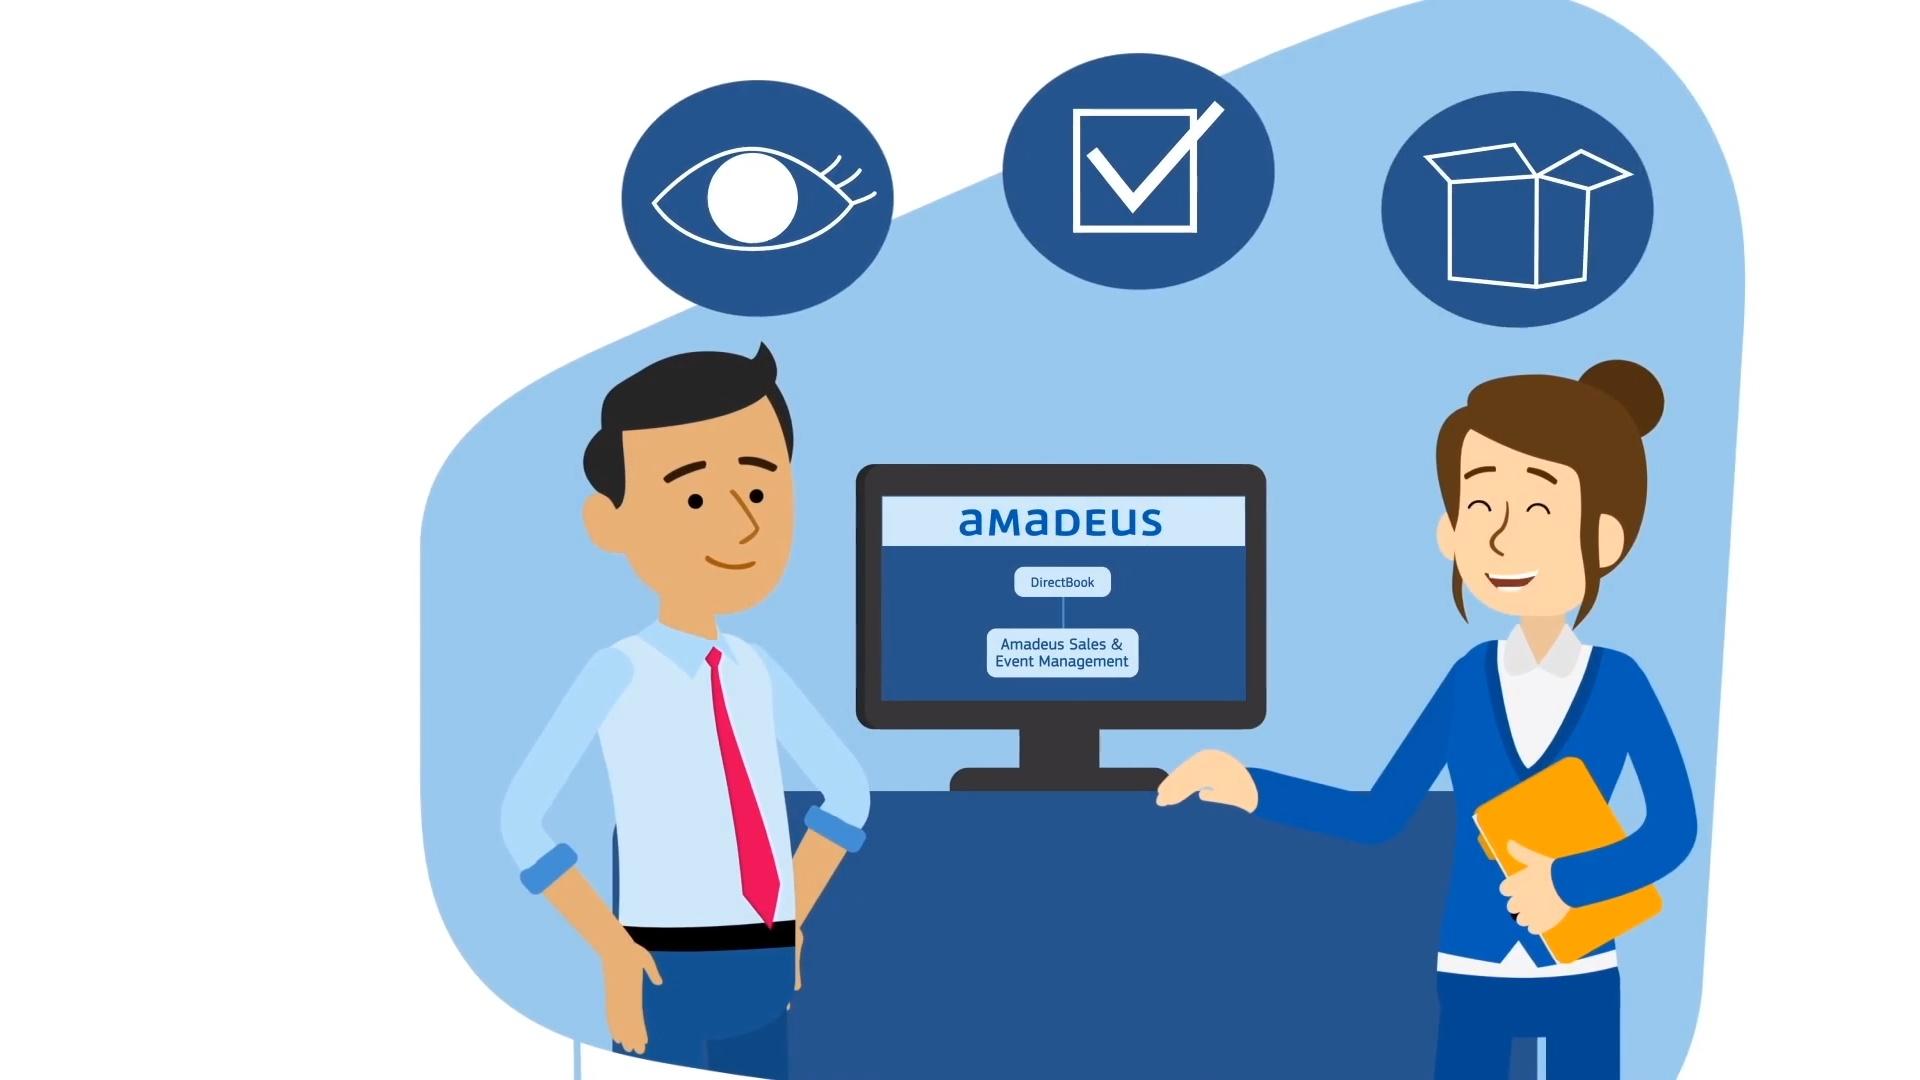 amadeus hospitality solutions [ 1920 x 1080 Pixel ]